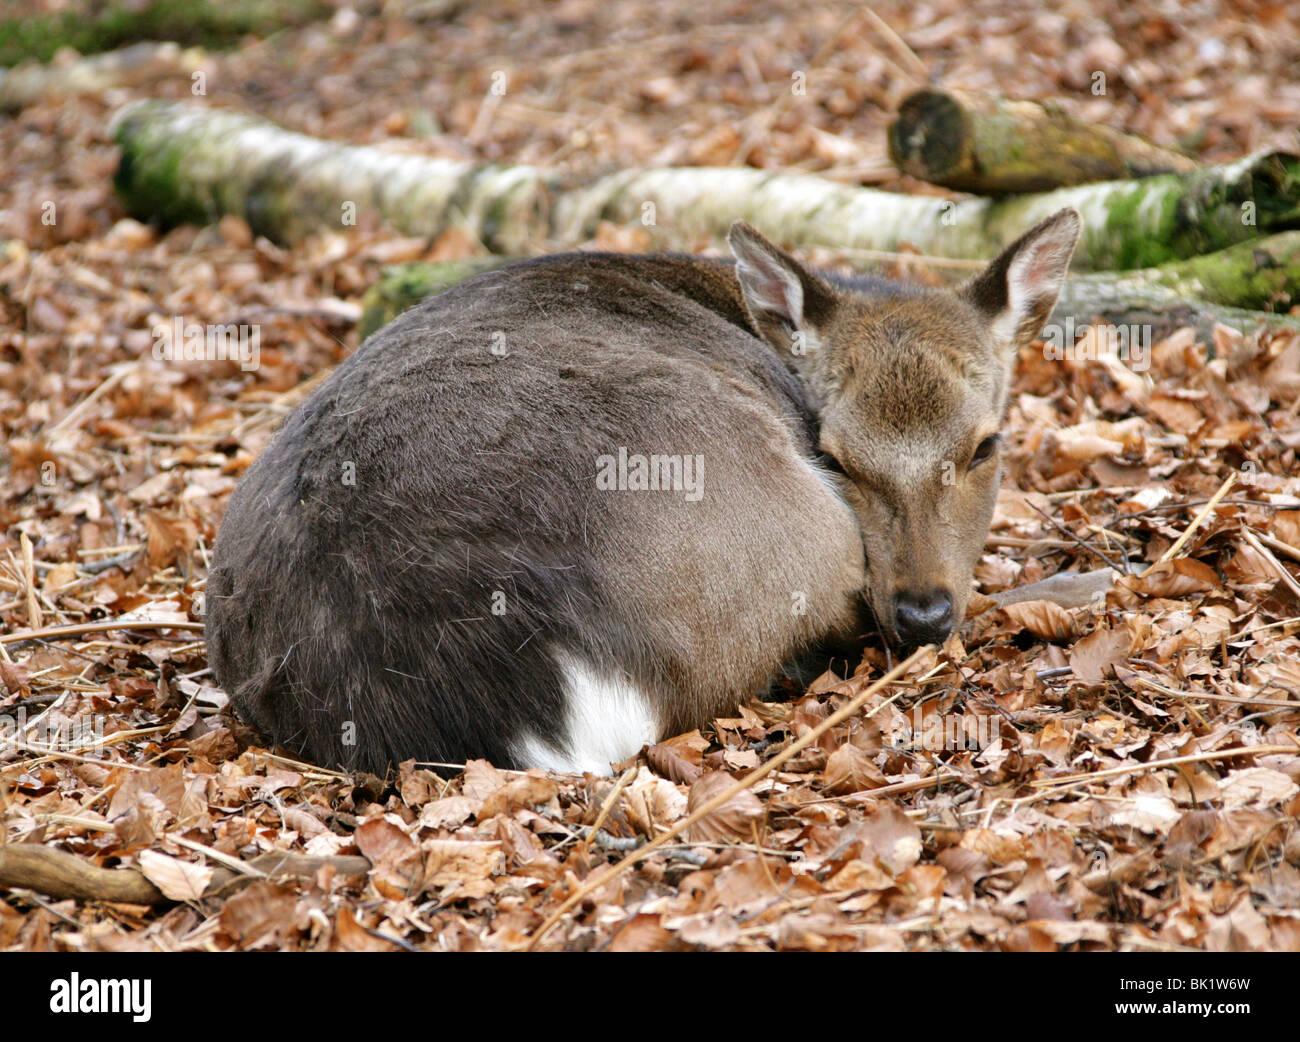 Sika Deer Fawn, Cervus Nippon Nippon Cervidae. Stockbild